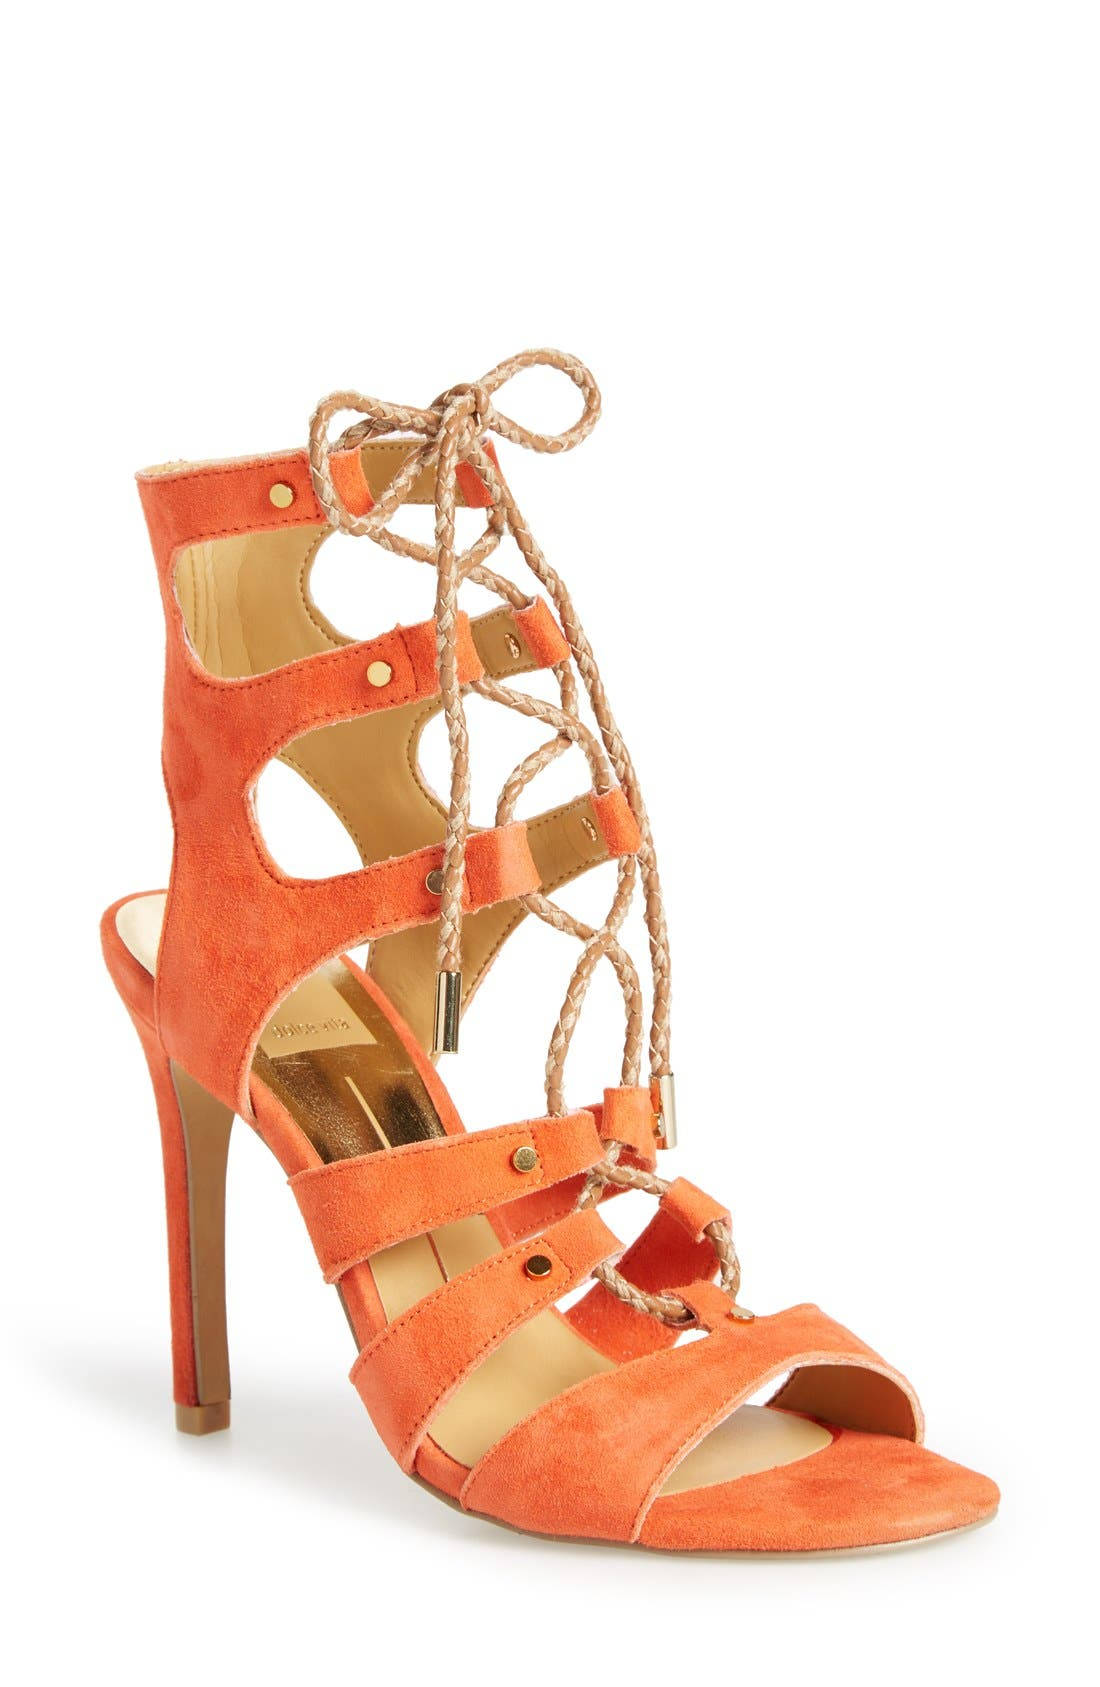 Main Image - Dolce Vita 'Howie' Lace-Up Sandal (Women)